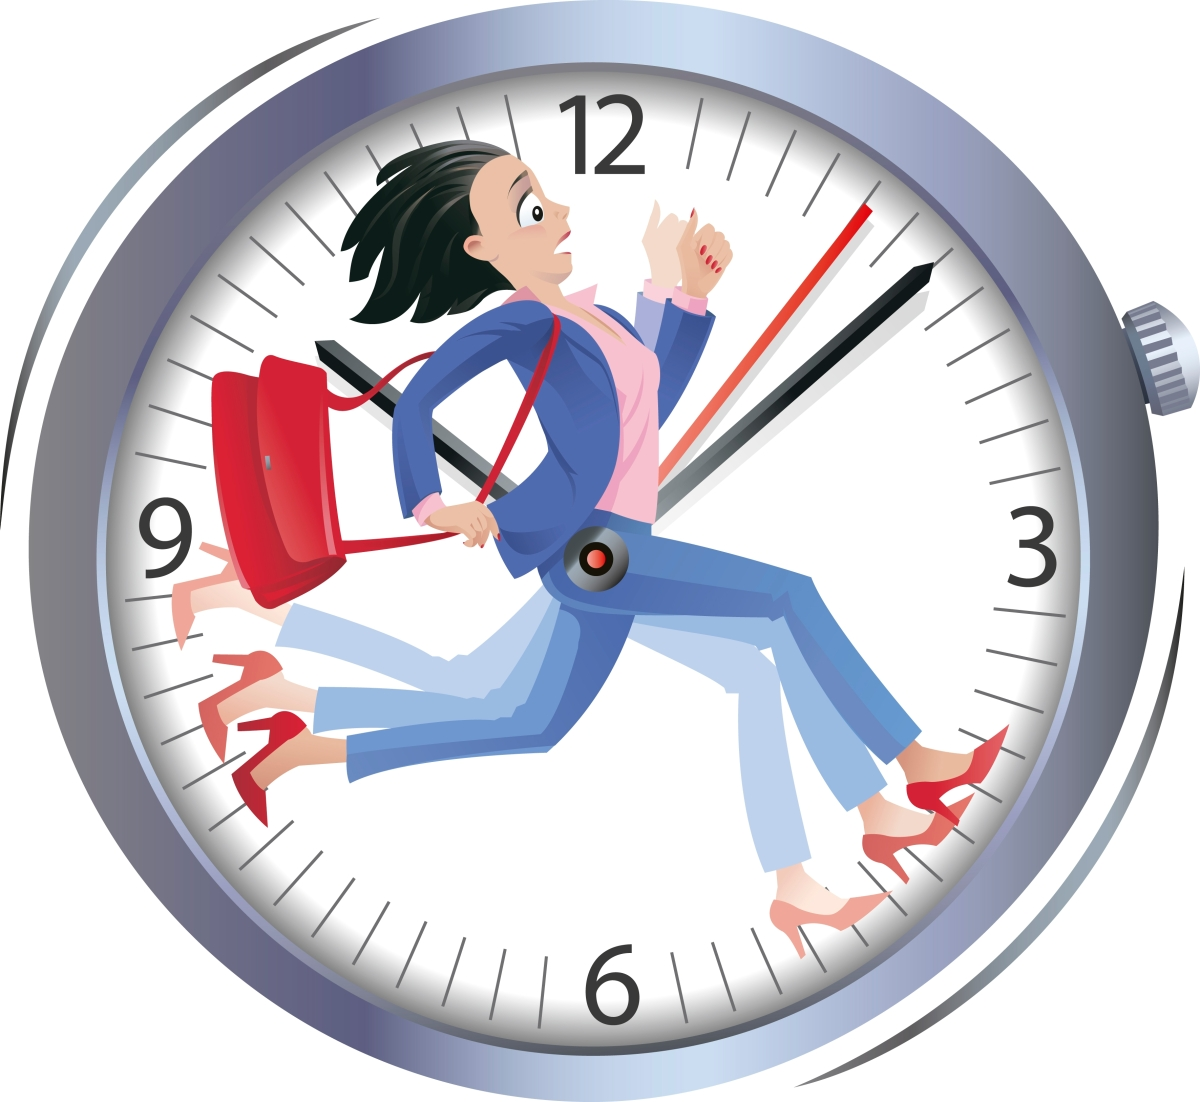 Lebih Baik Menunggu 2 Jam daripada terlambat 1menit